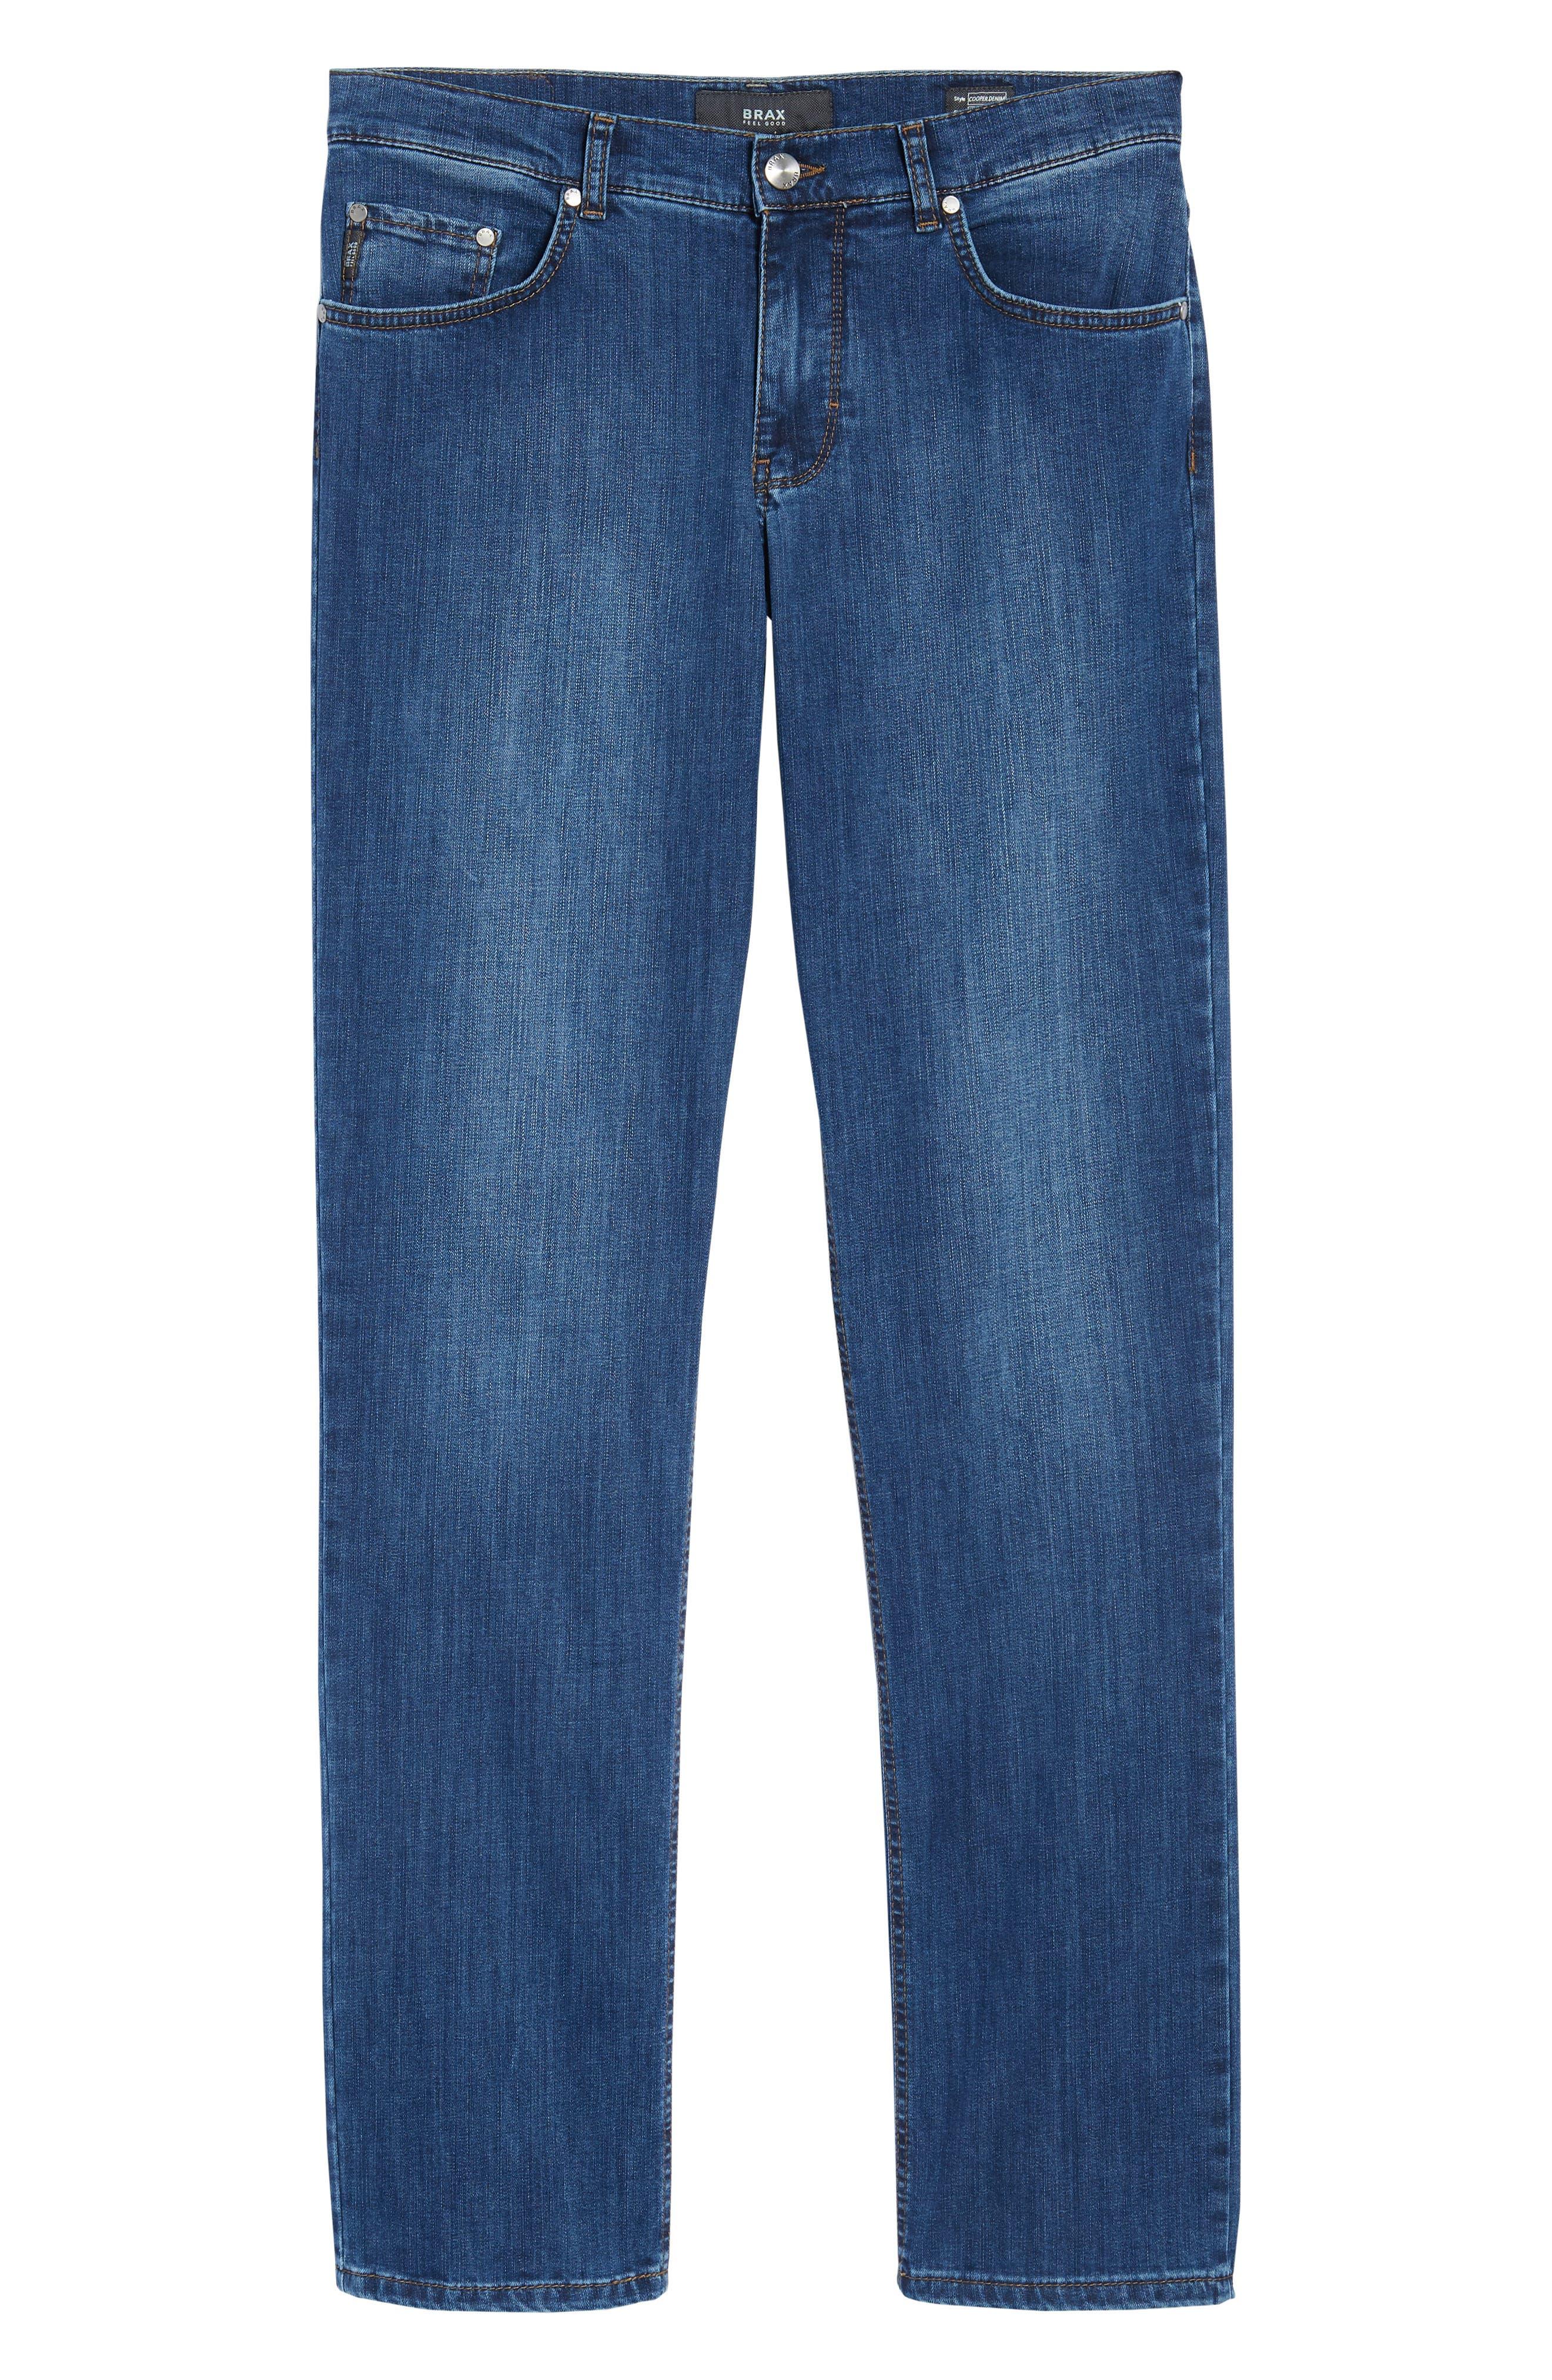 Masterpiece Regular Jeans,                             Alternate thumbnail 18, color,